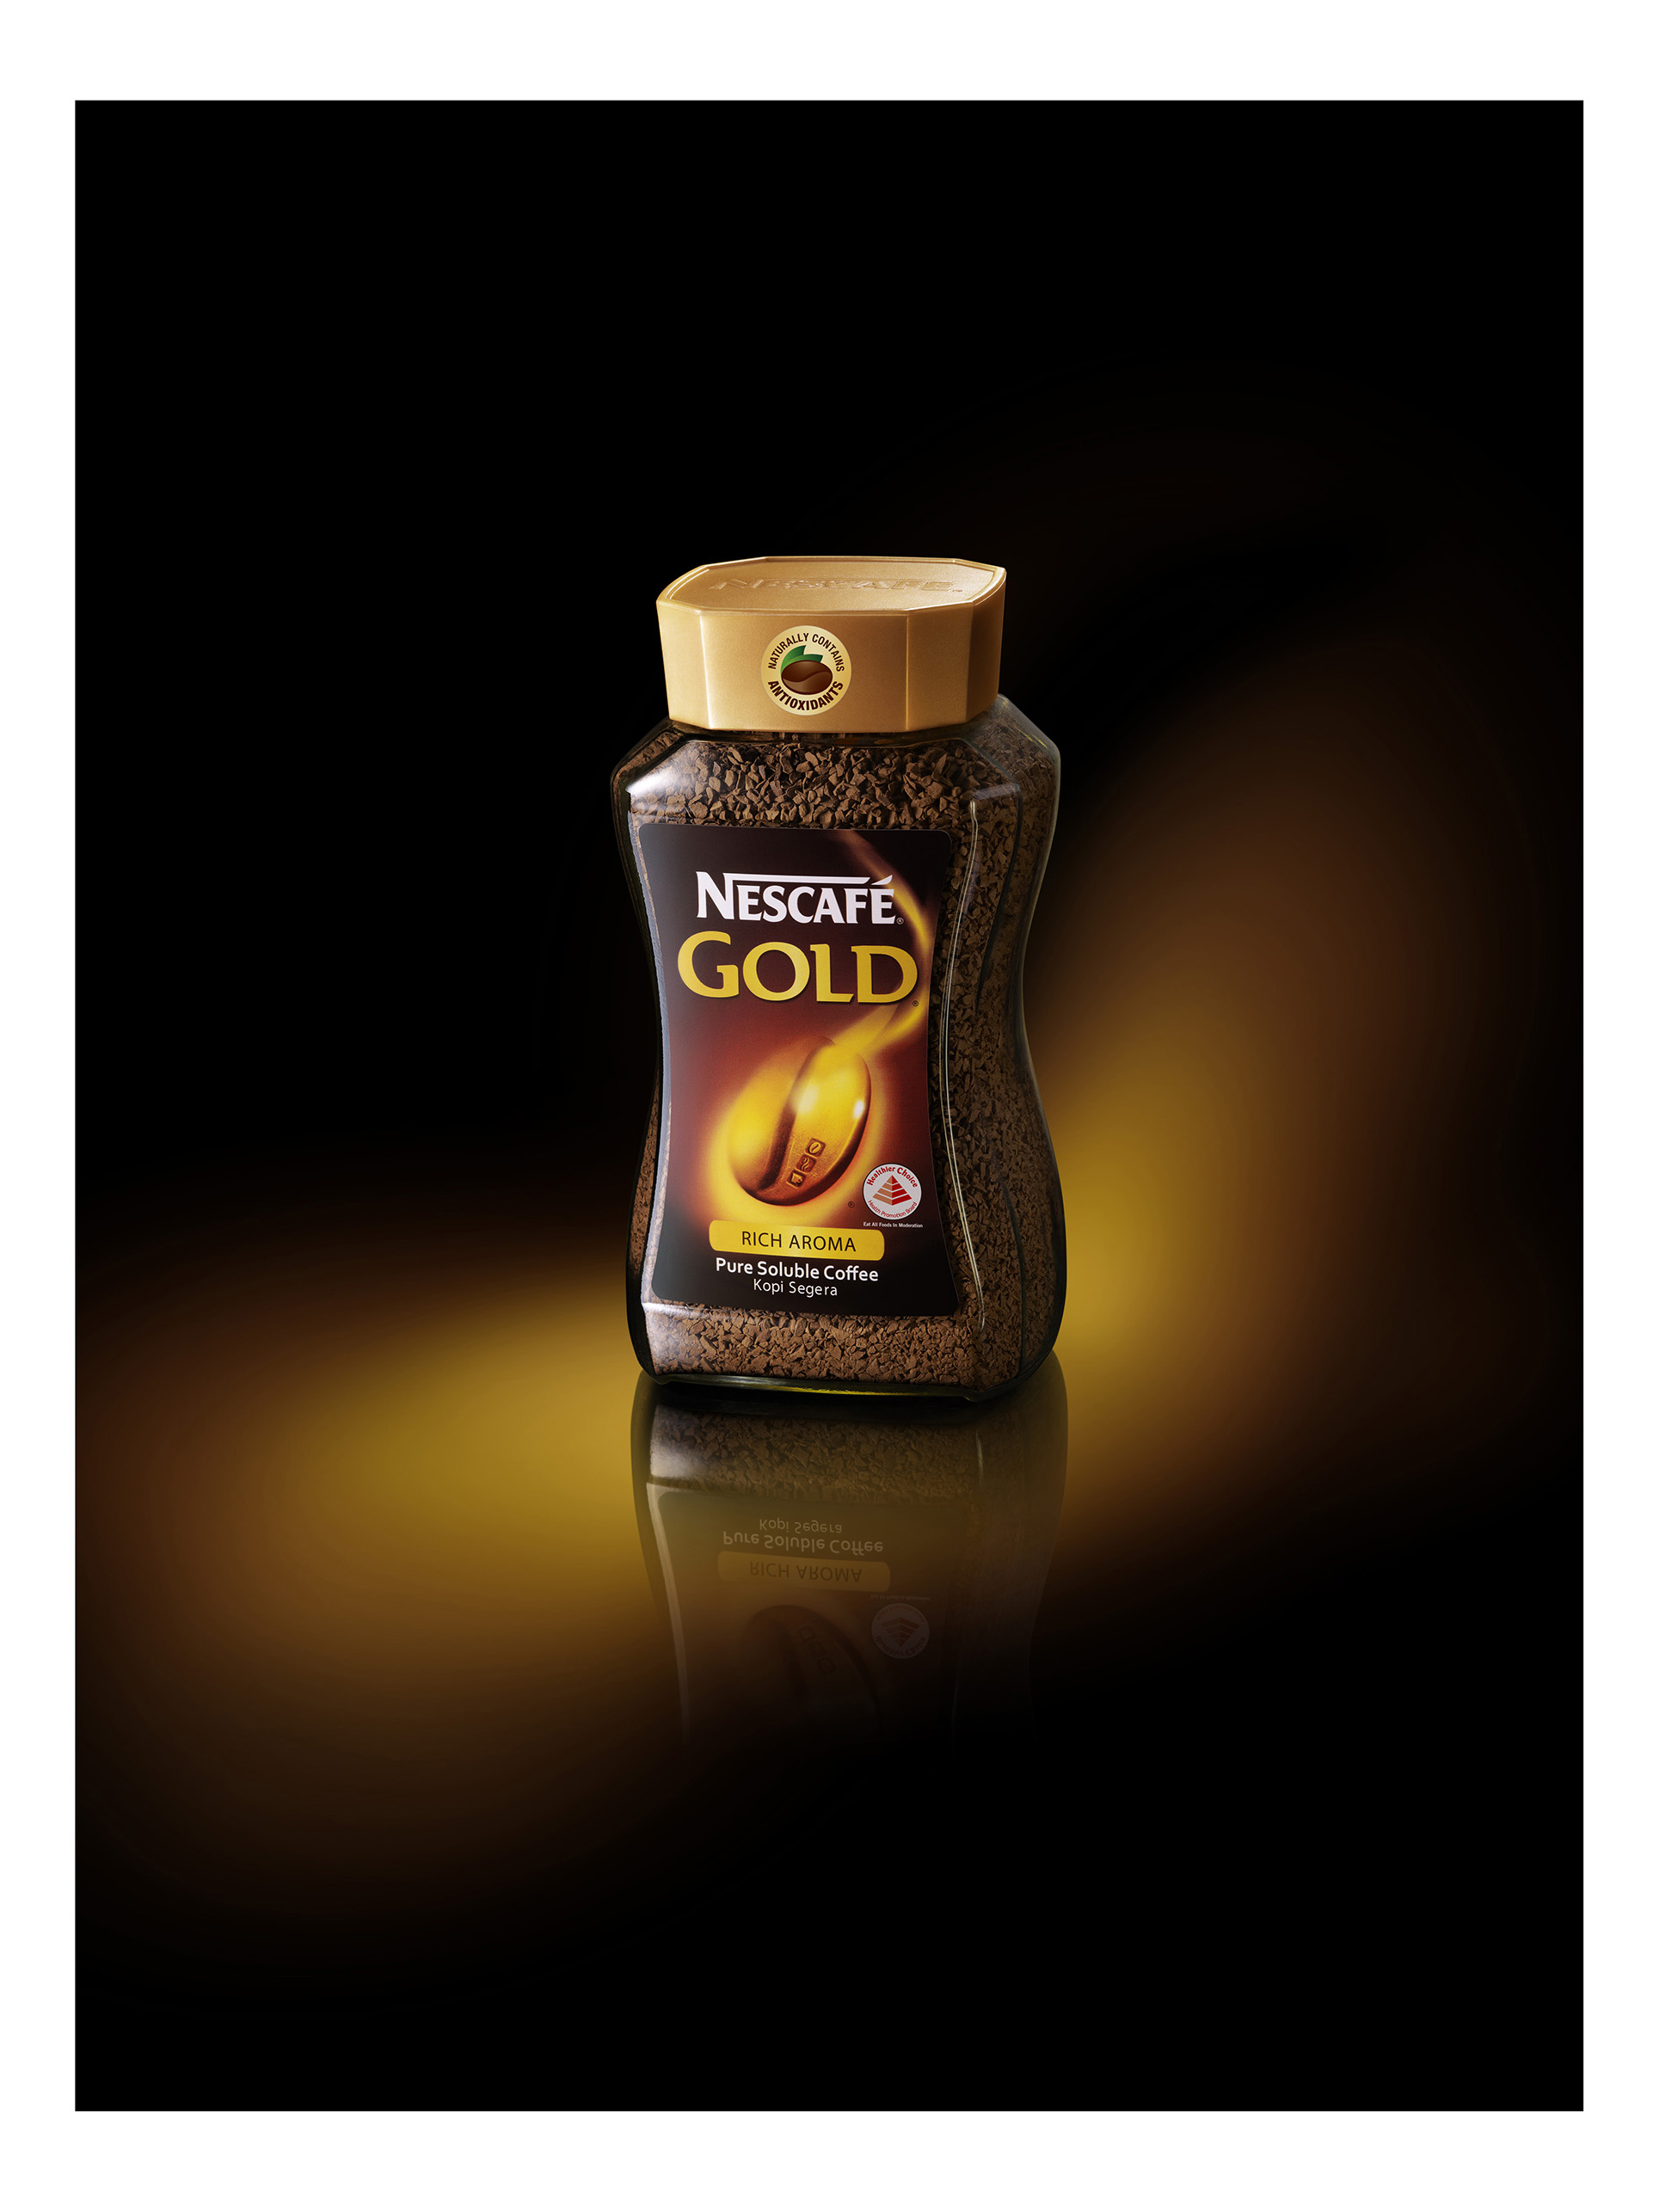 Nescafe Gold.jpg